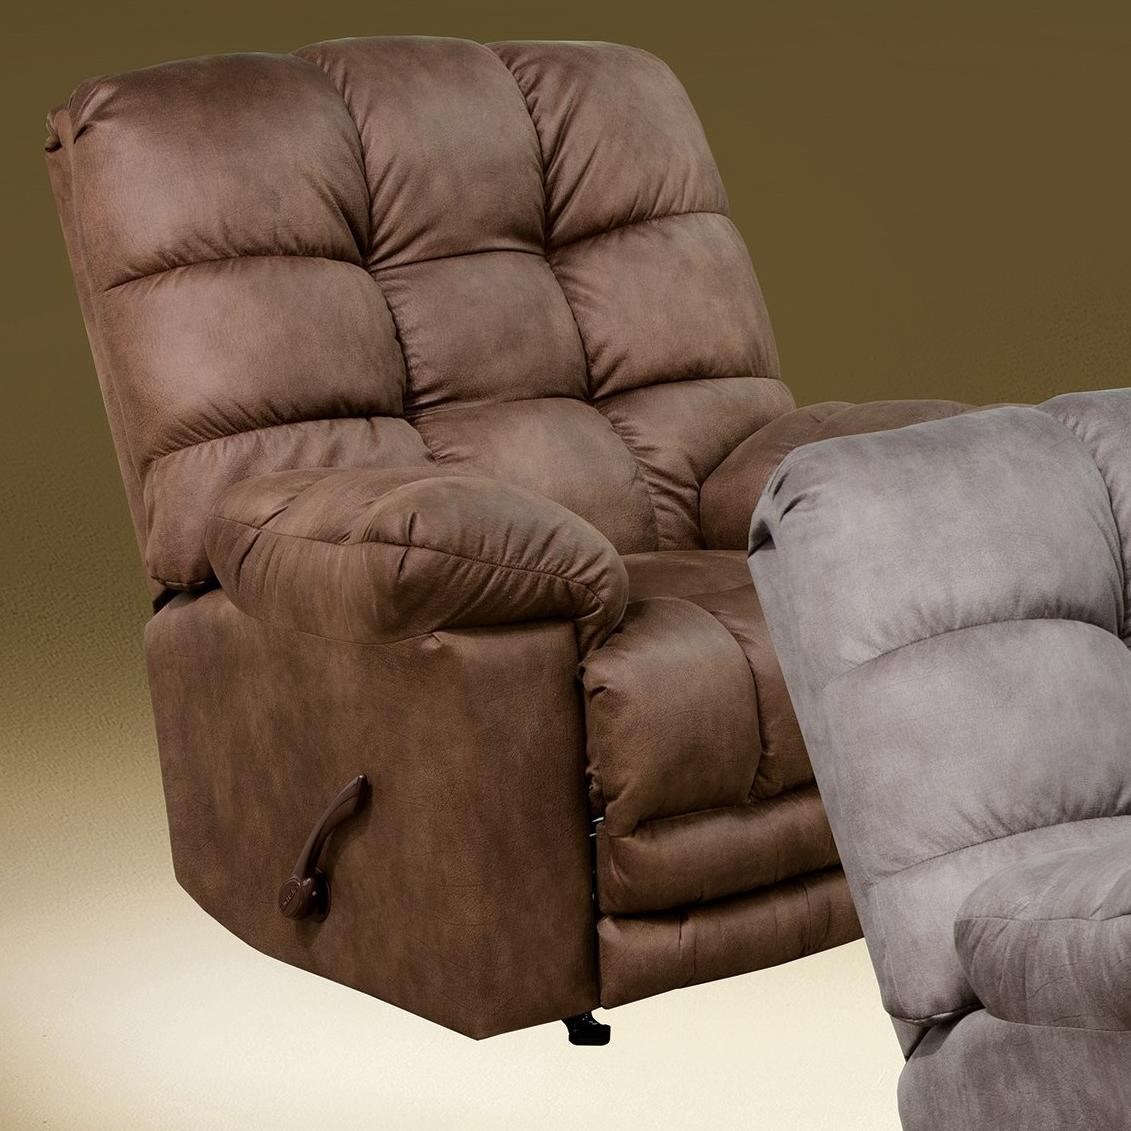 Machado Chaise Rocker Recliner w/ Oversized Footrest by Catnapper at Lapeer Furniture & Mattress Center